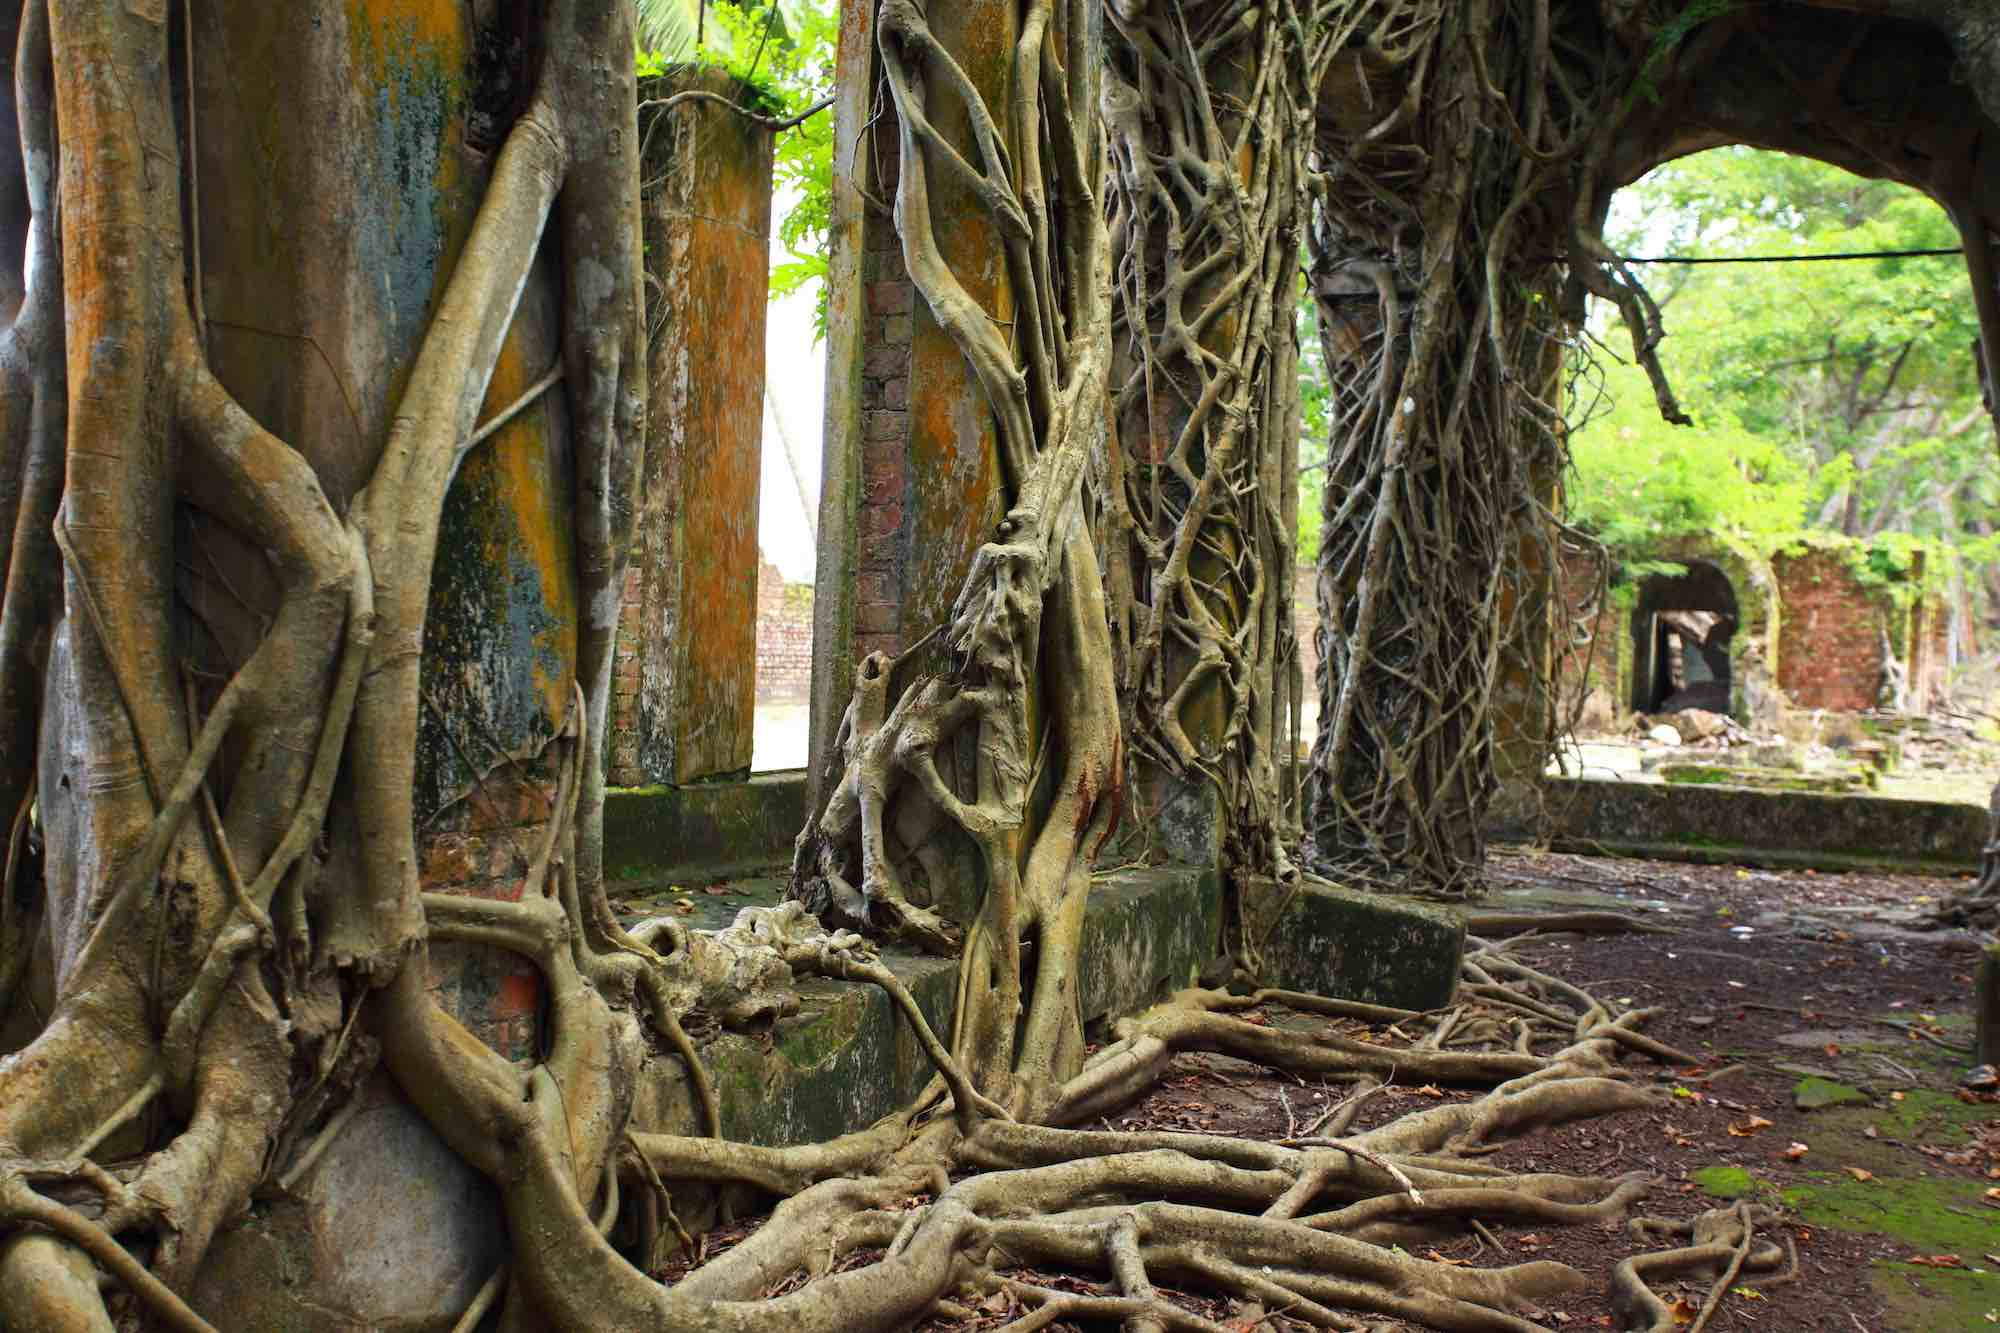 Andaman Islands_old trees and brick houses sailing trip_XS.jpeg